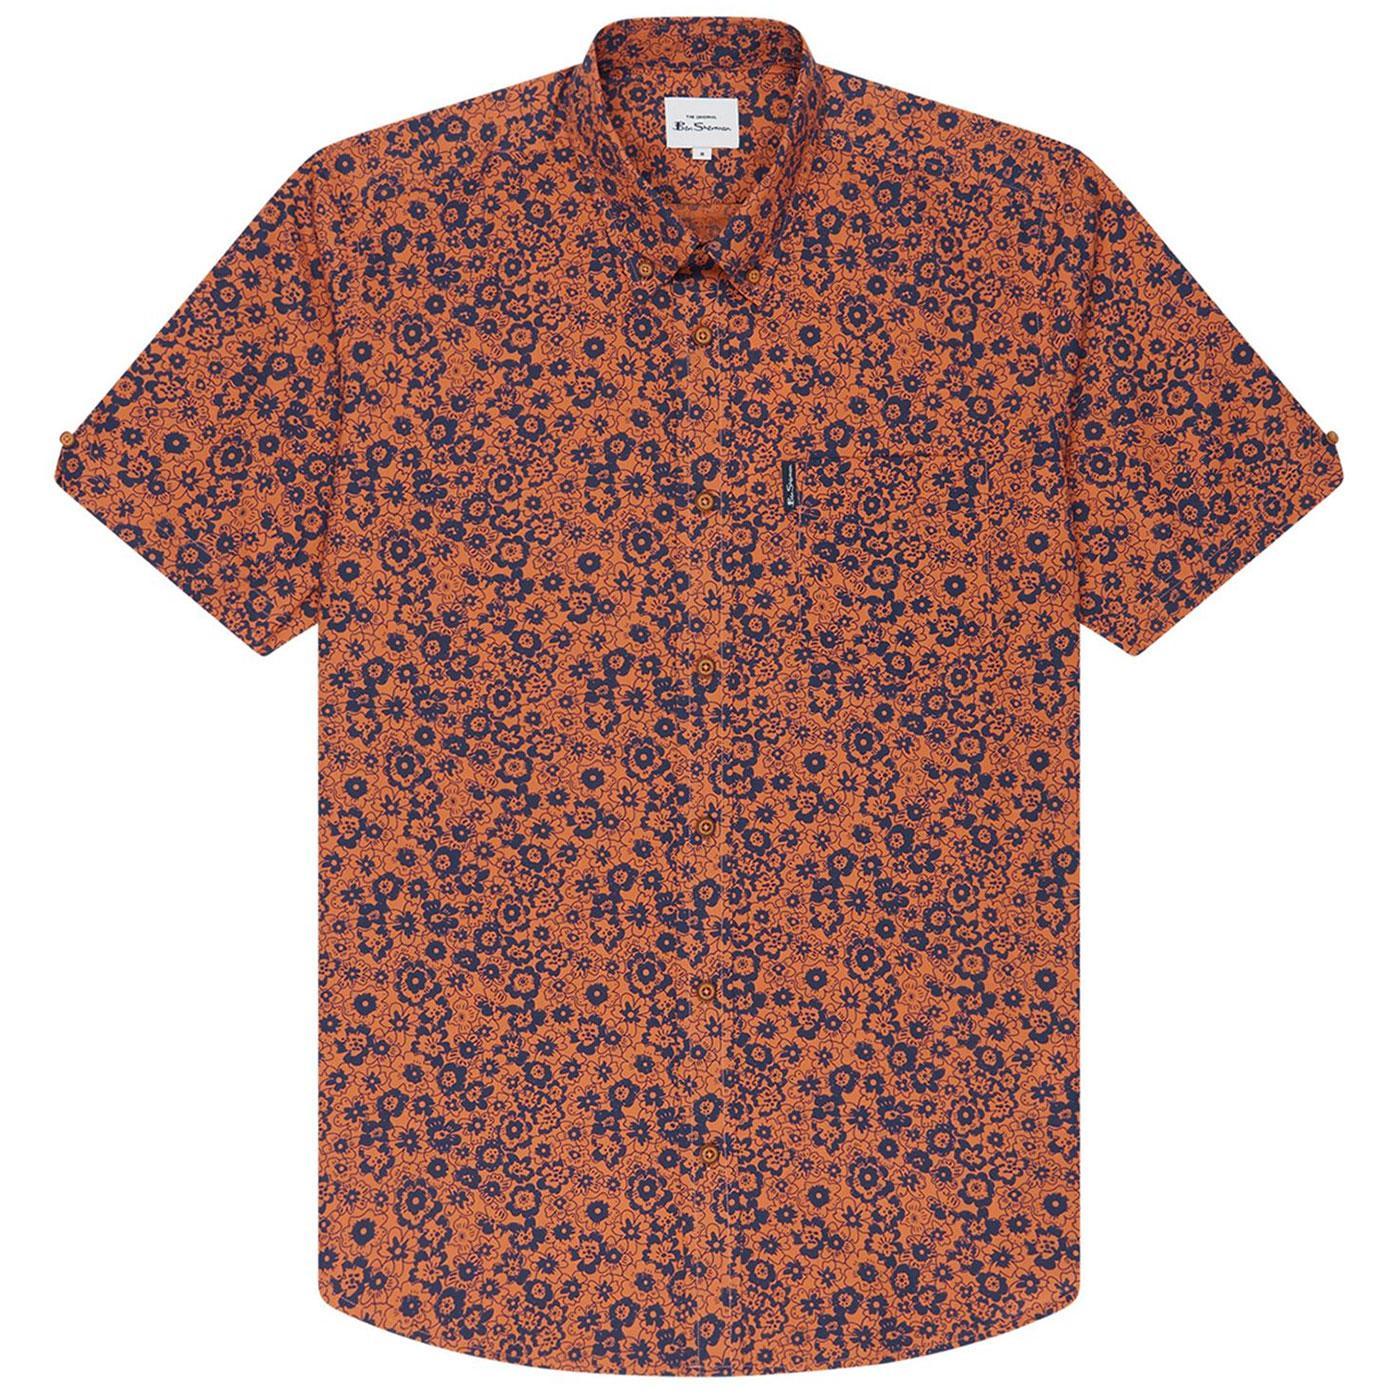 BEN SHERMAN Retro 70s Floral Summer Shirt - Anise